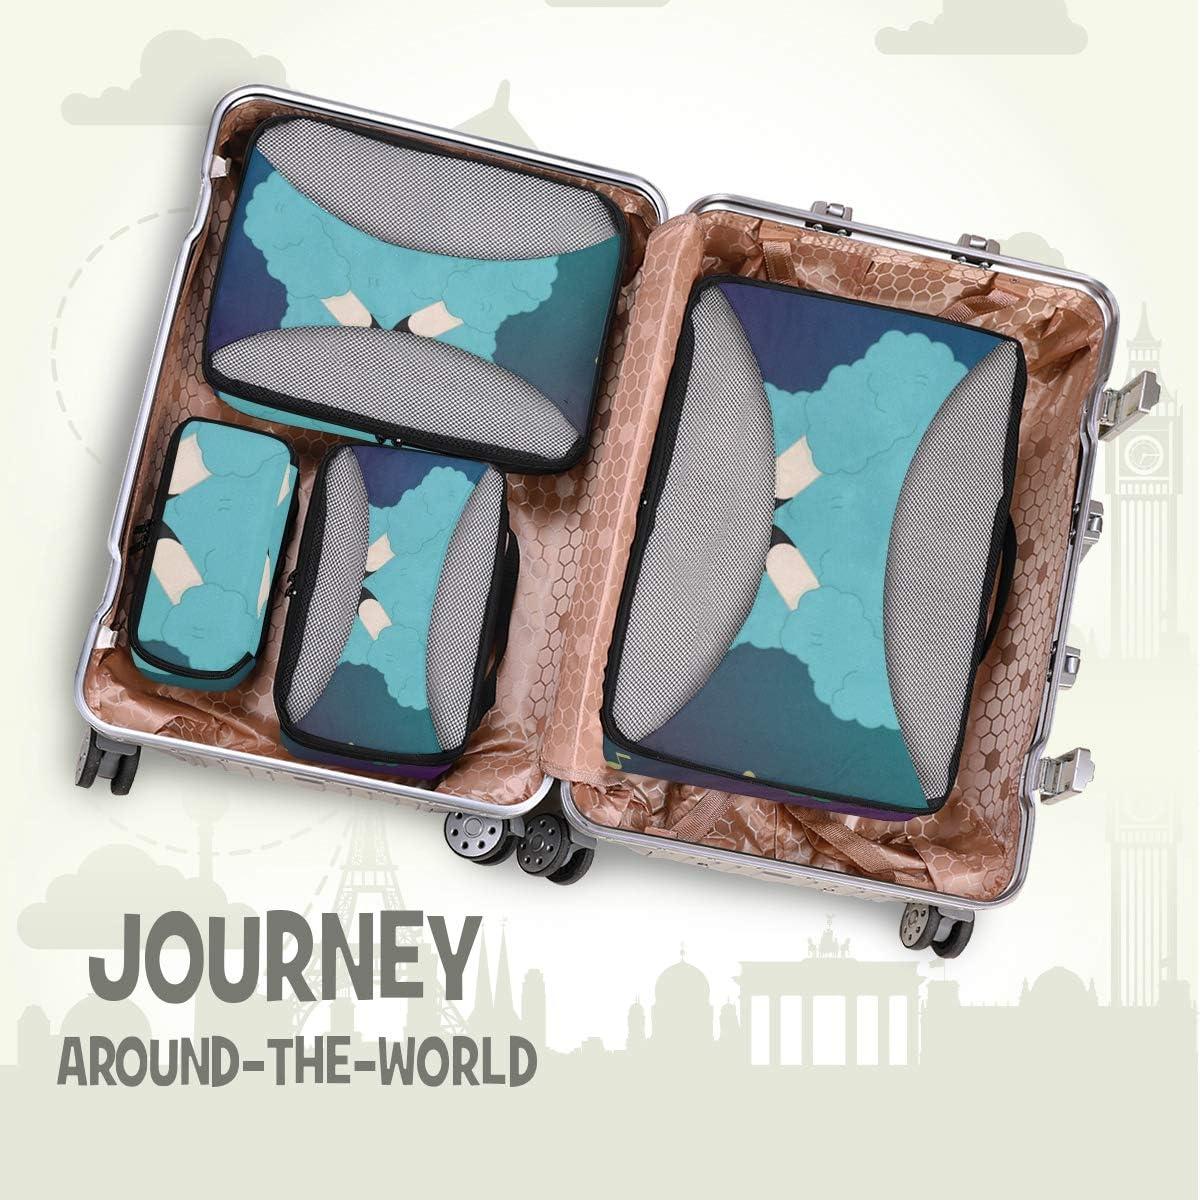 4 Set Packing Cubes Travel Luggage Packing Organizers Dancing Llama